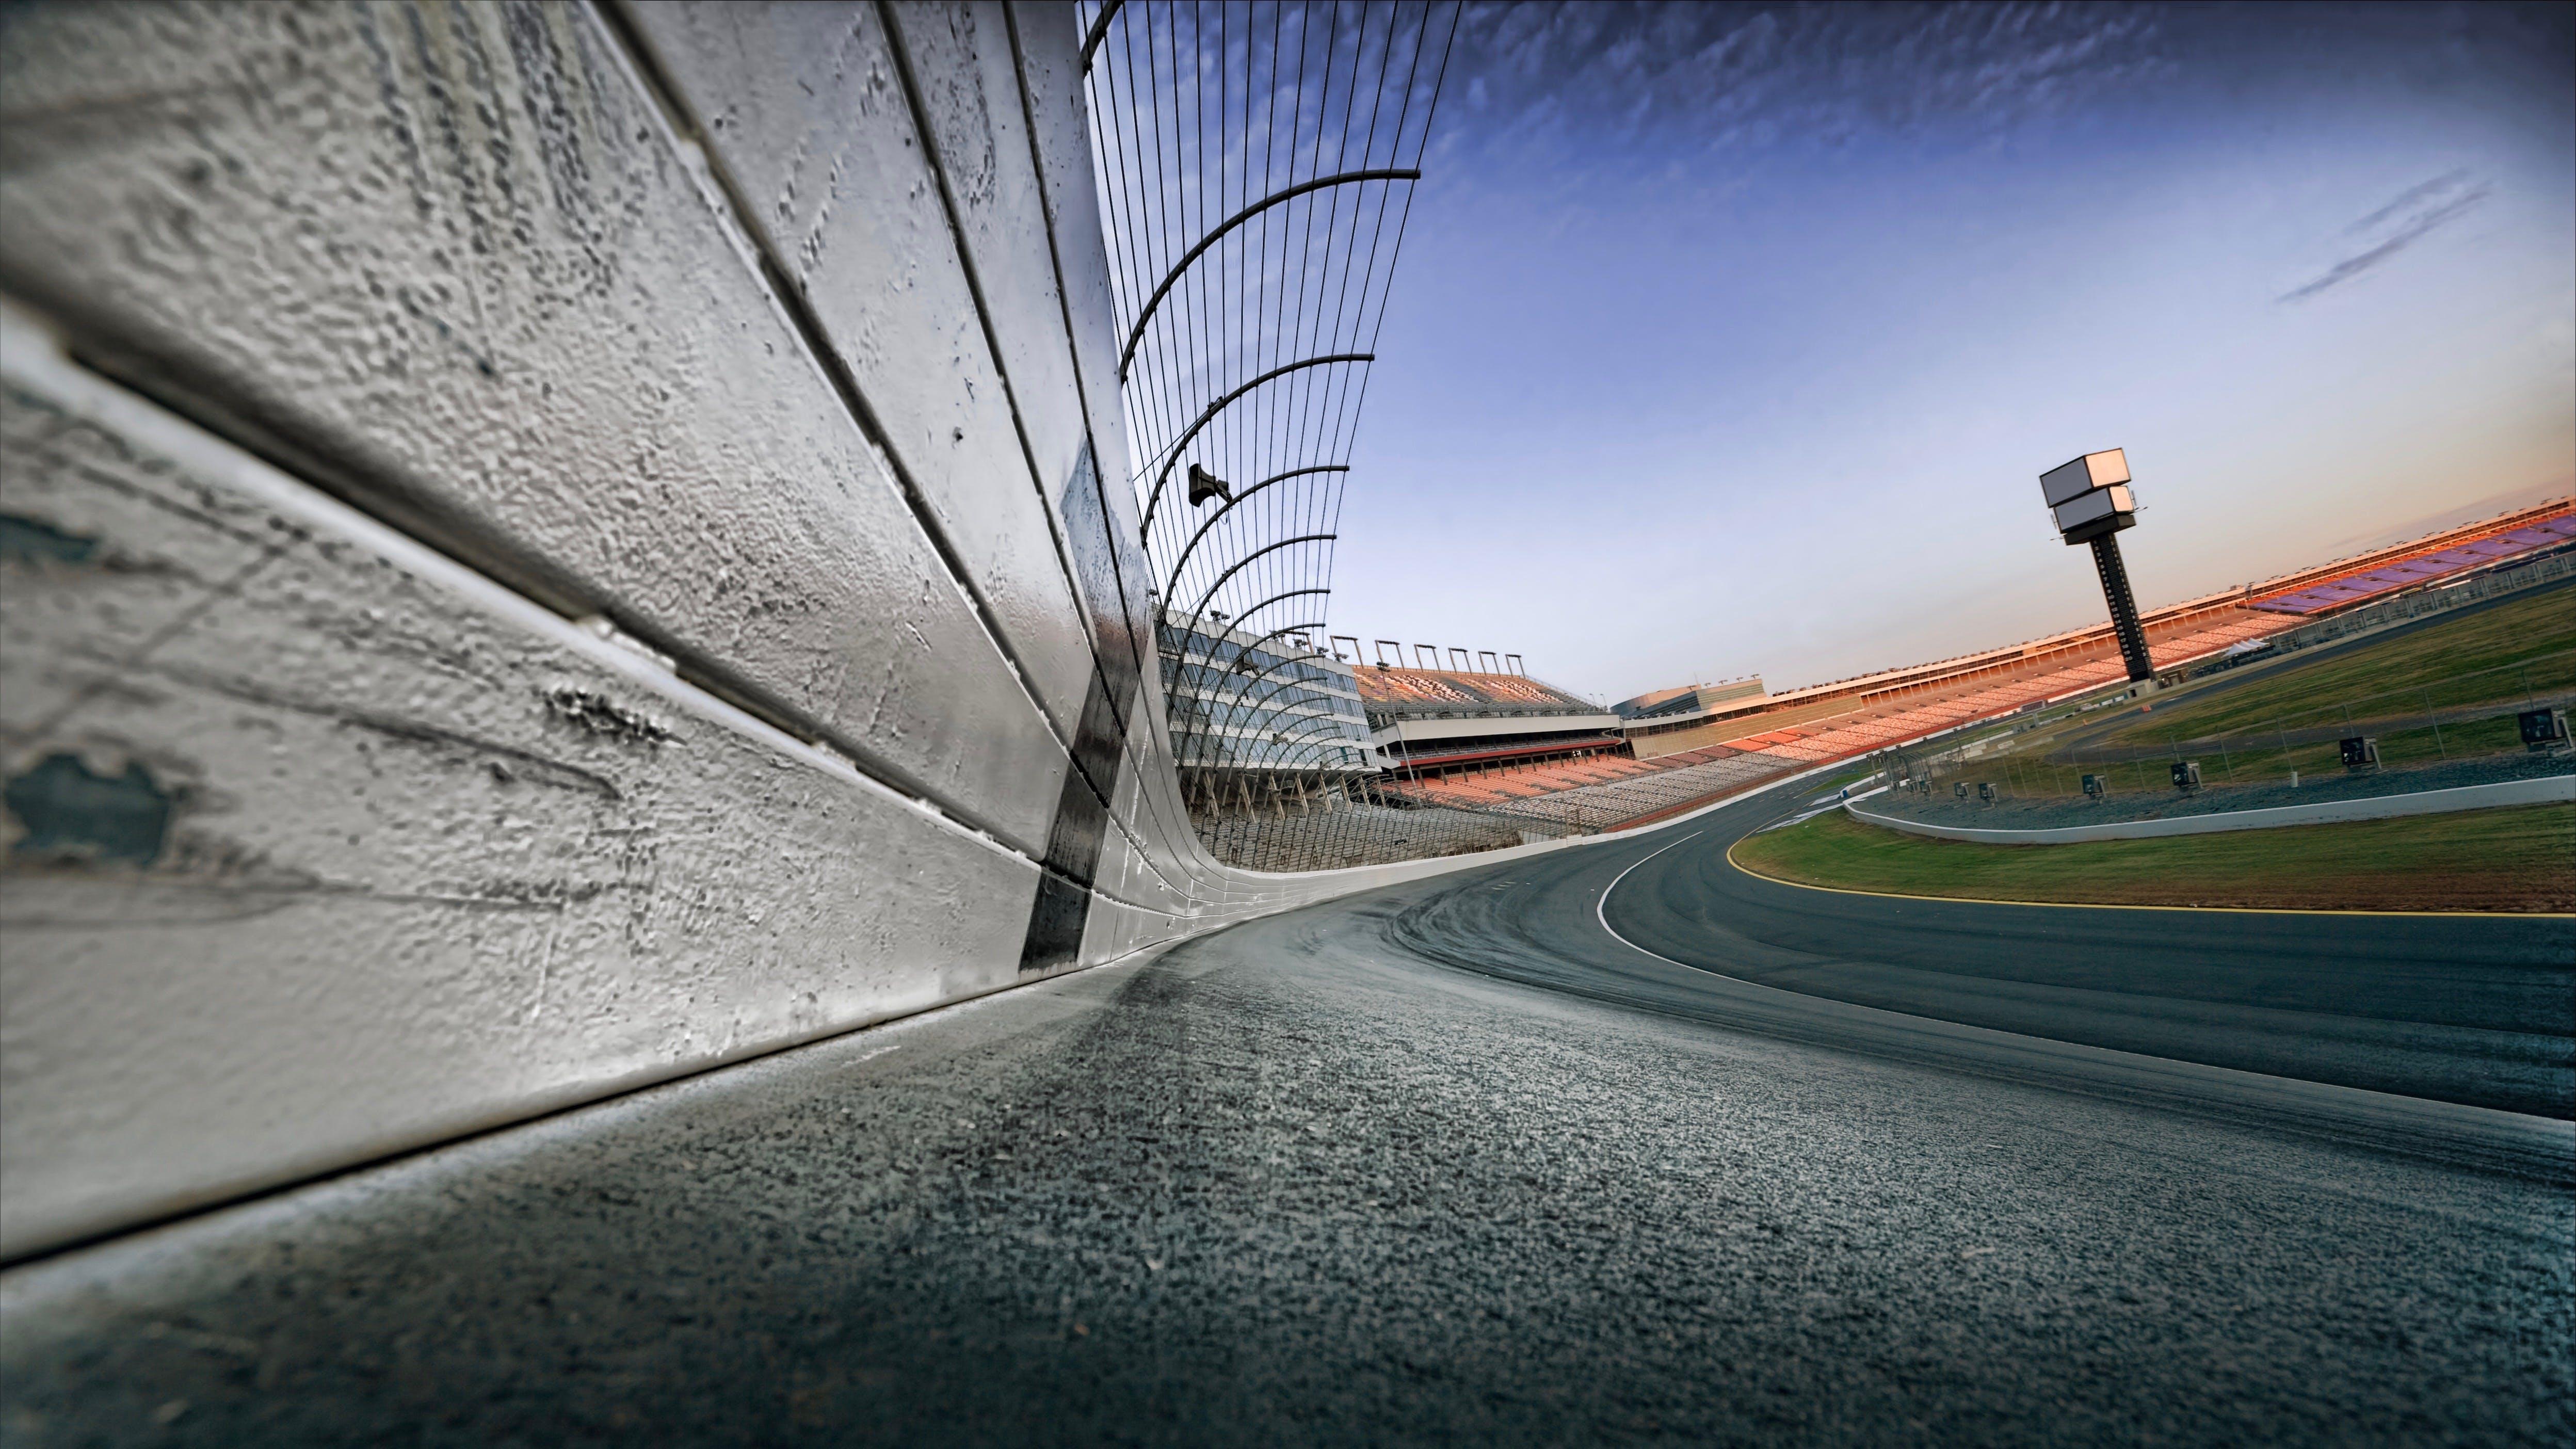 NASCAR race track at dawn